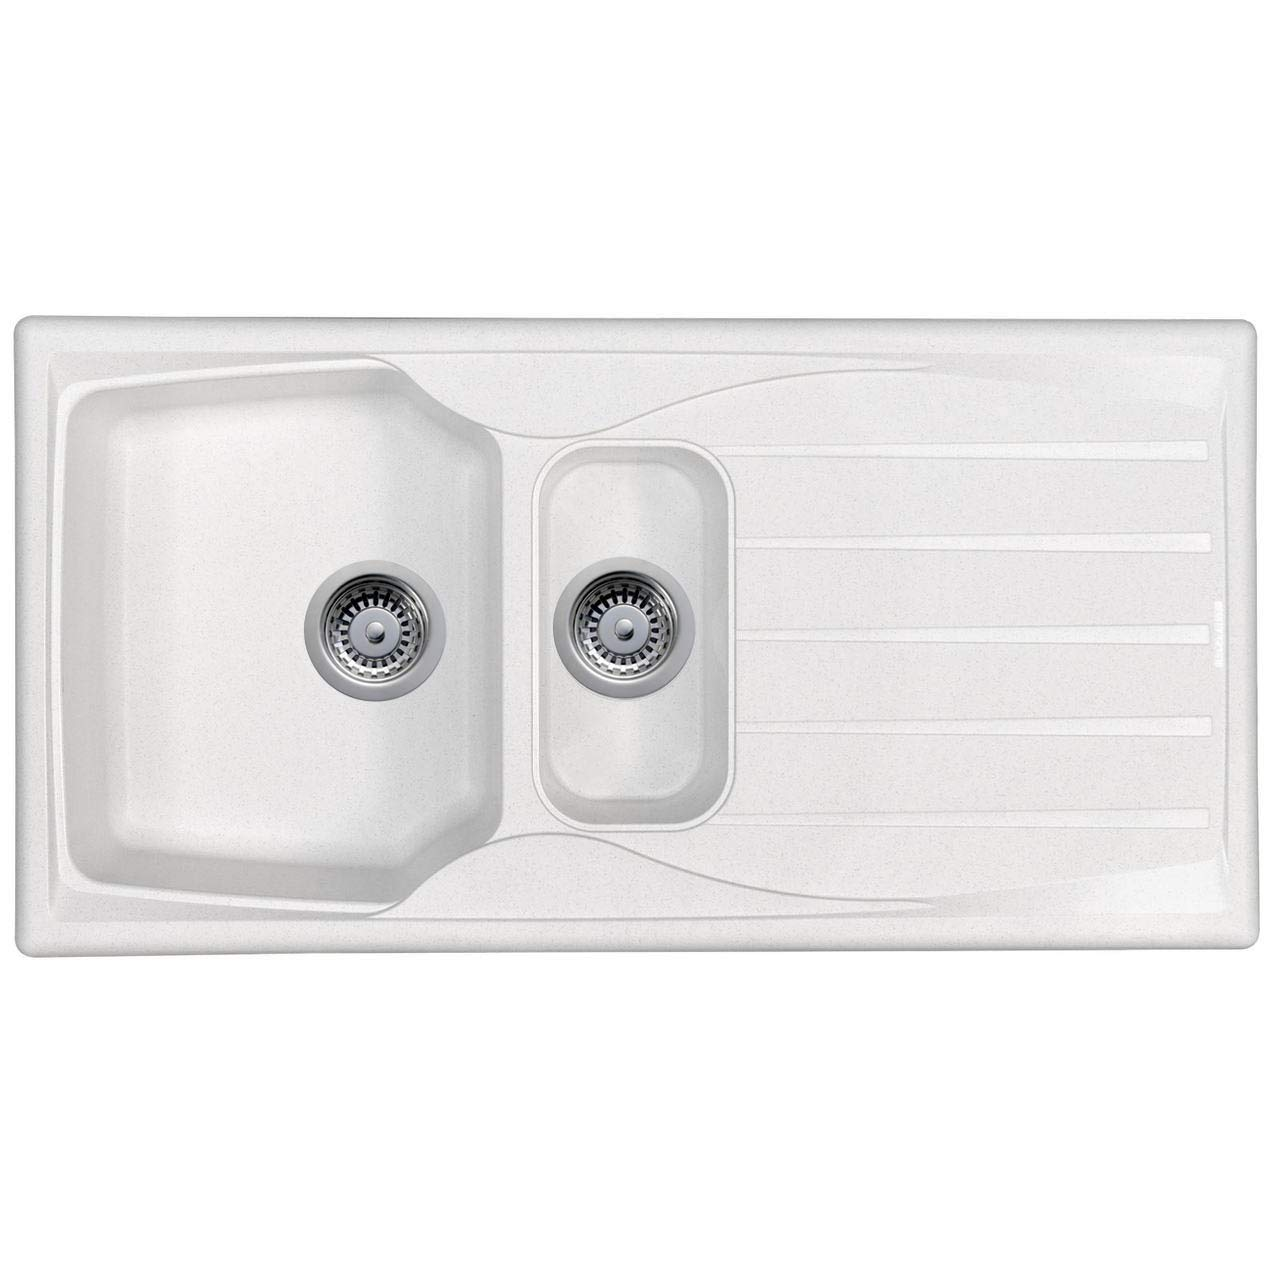 Astracast Sierra 1 5 Bowl Reversible Teflite Kitchen Sink In White Waste Kit Buy Online In Belarus At Desertcart